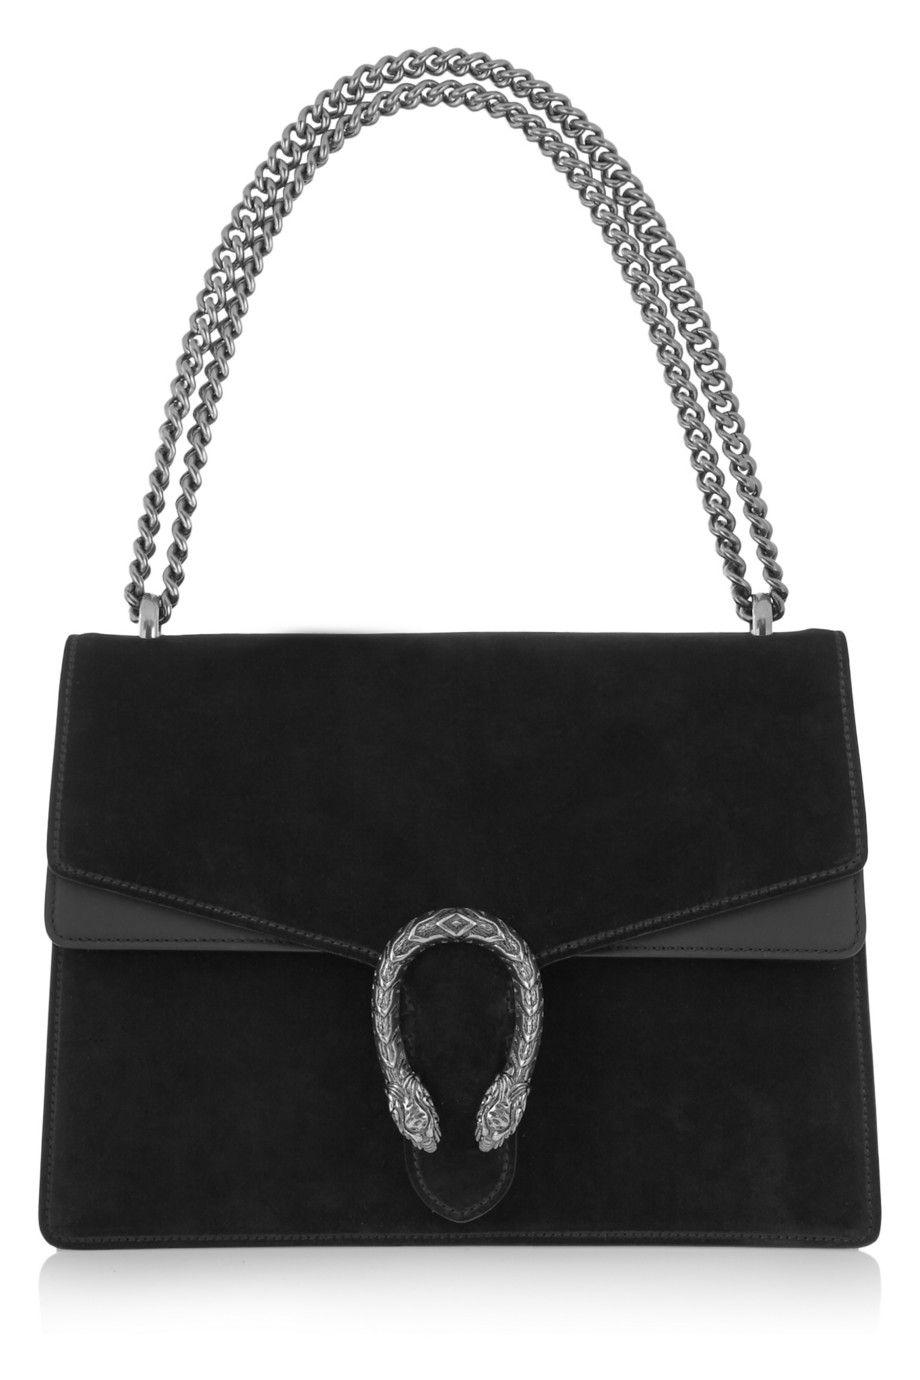 Gucci   Dionysus medium suede and leather shoulder bag   NET-A-PORTER.COM 287a1f1c570